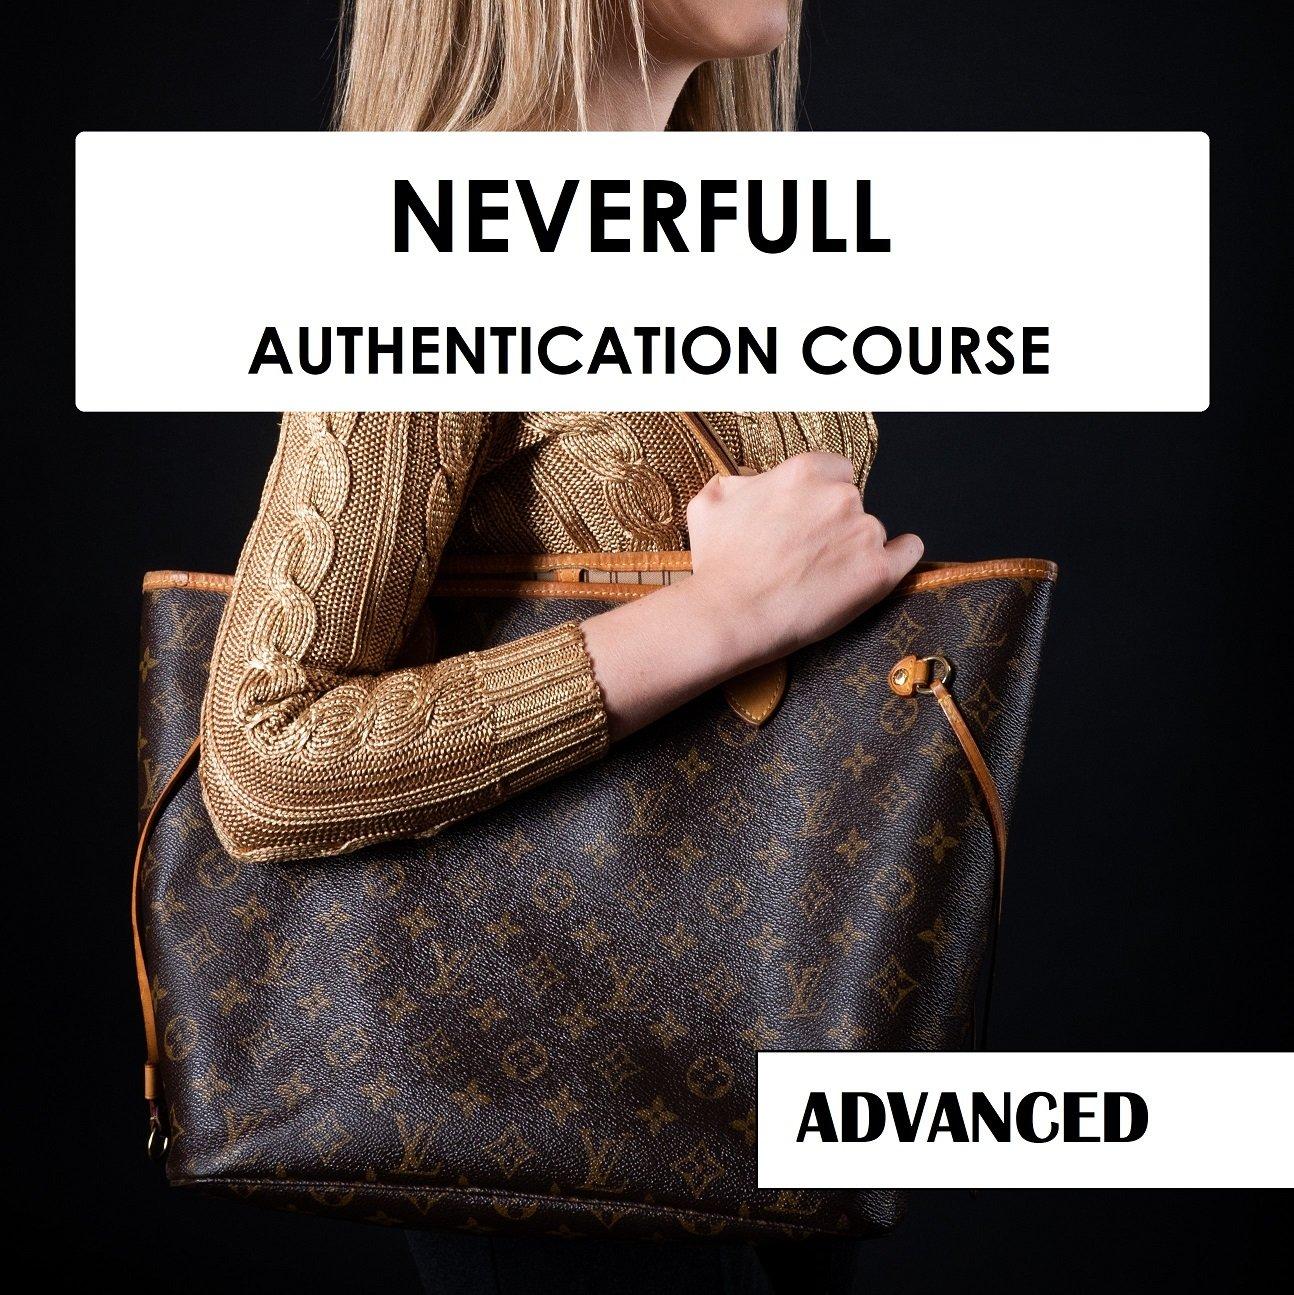 Louis Vuitton Neverfull Authentication Course (ADVANCED)